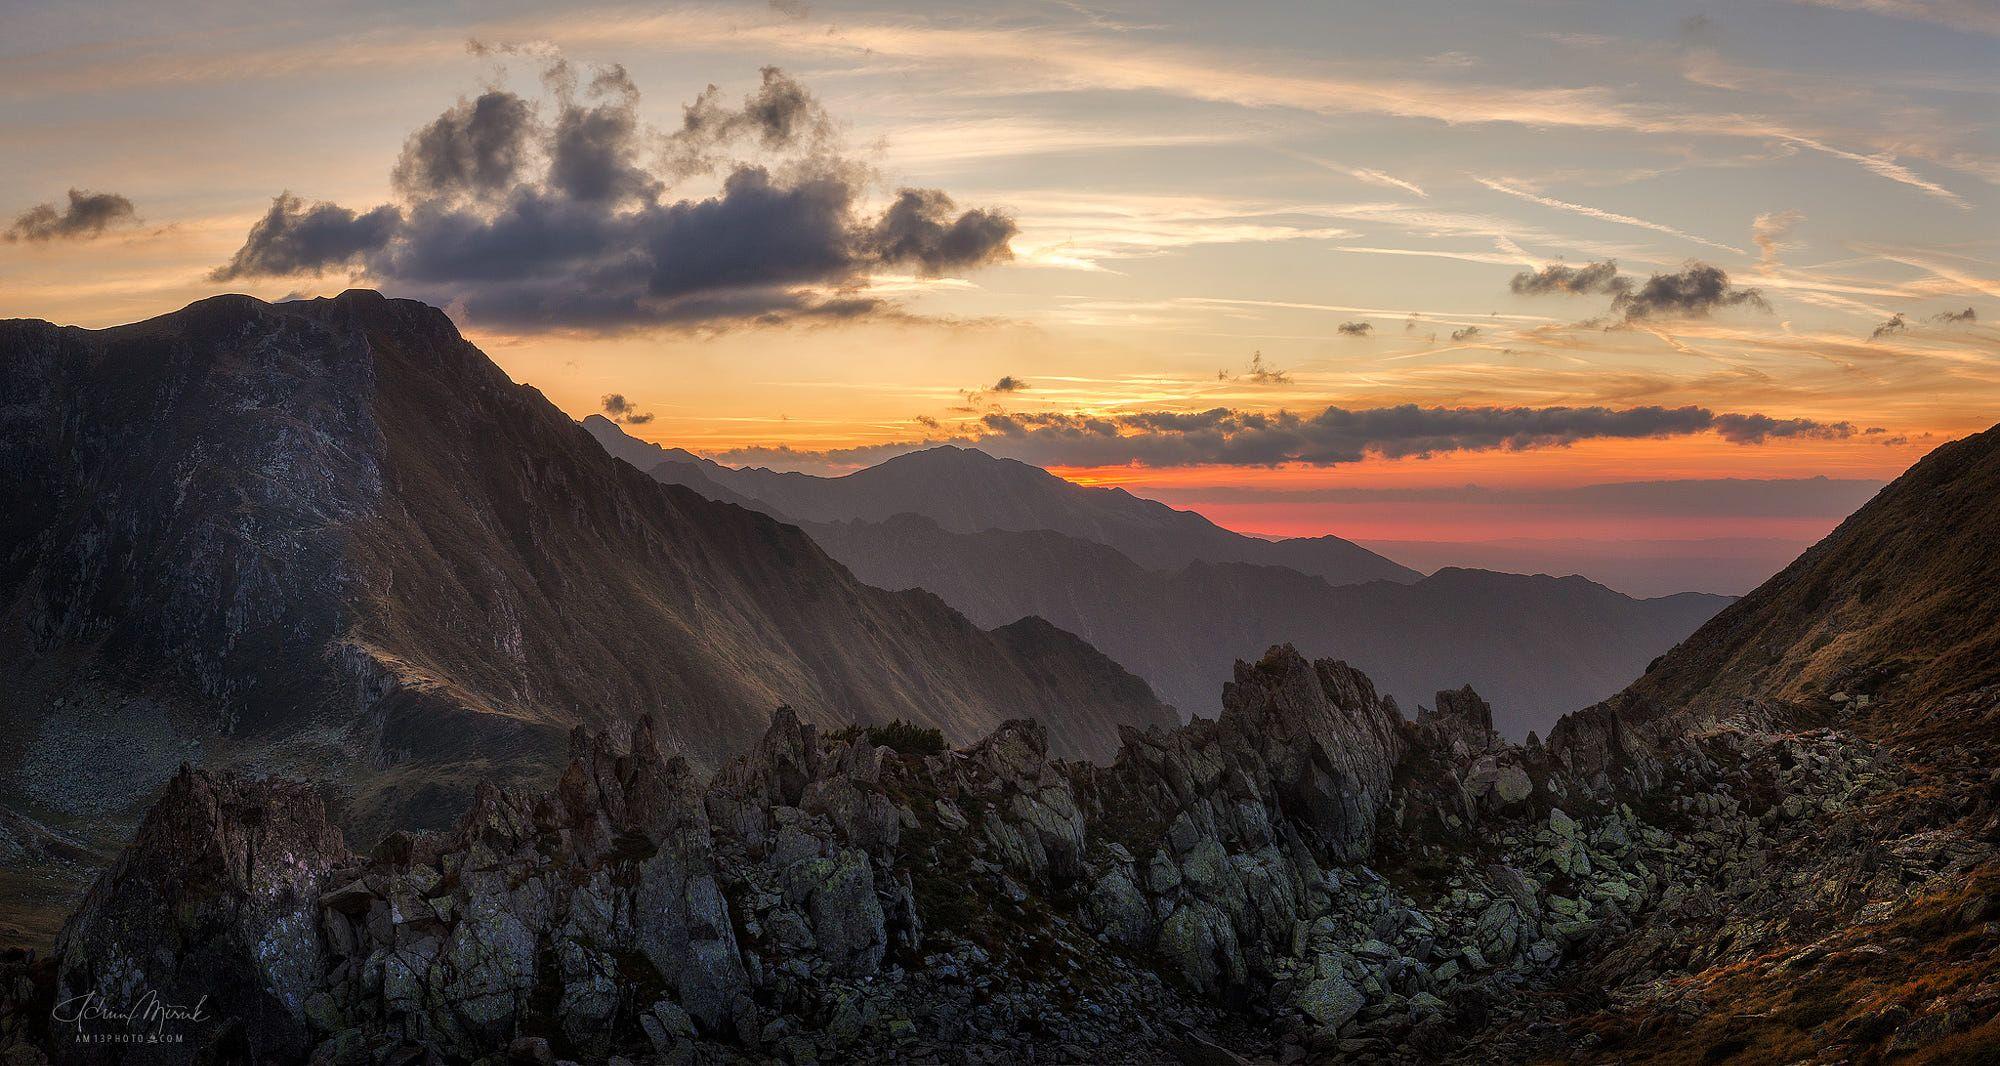 Sunset from Fagaras moutain, Romania